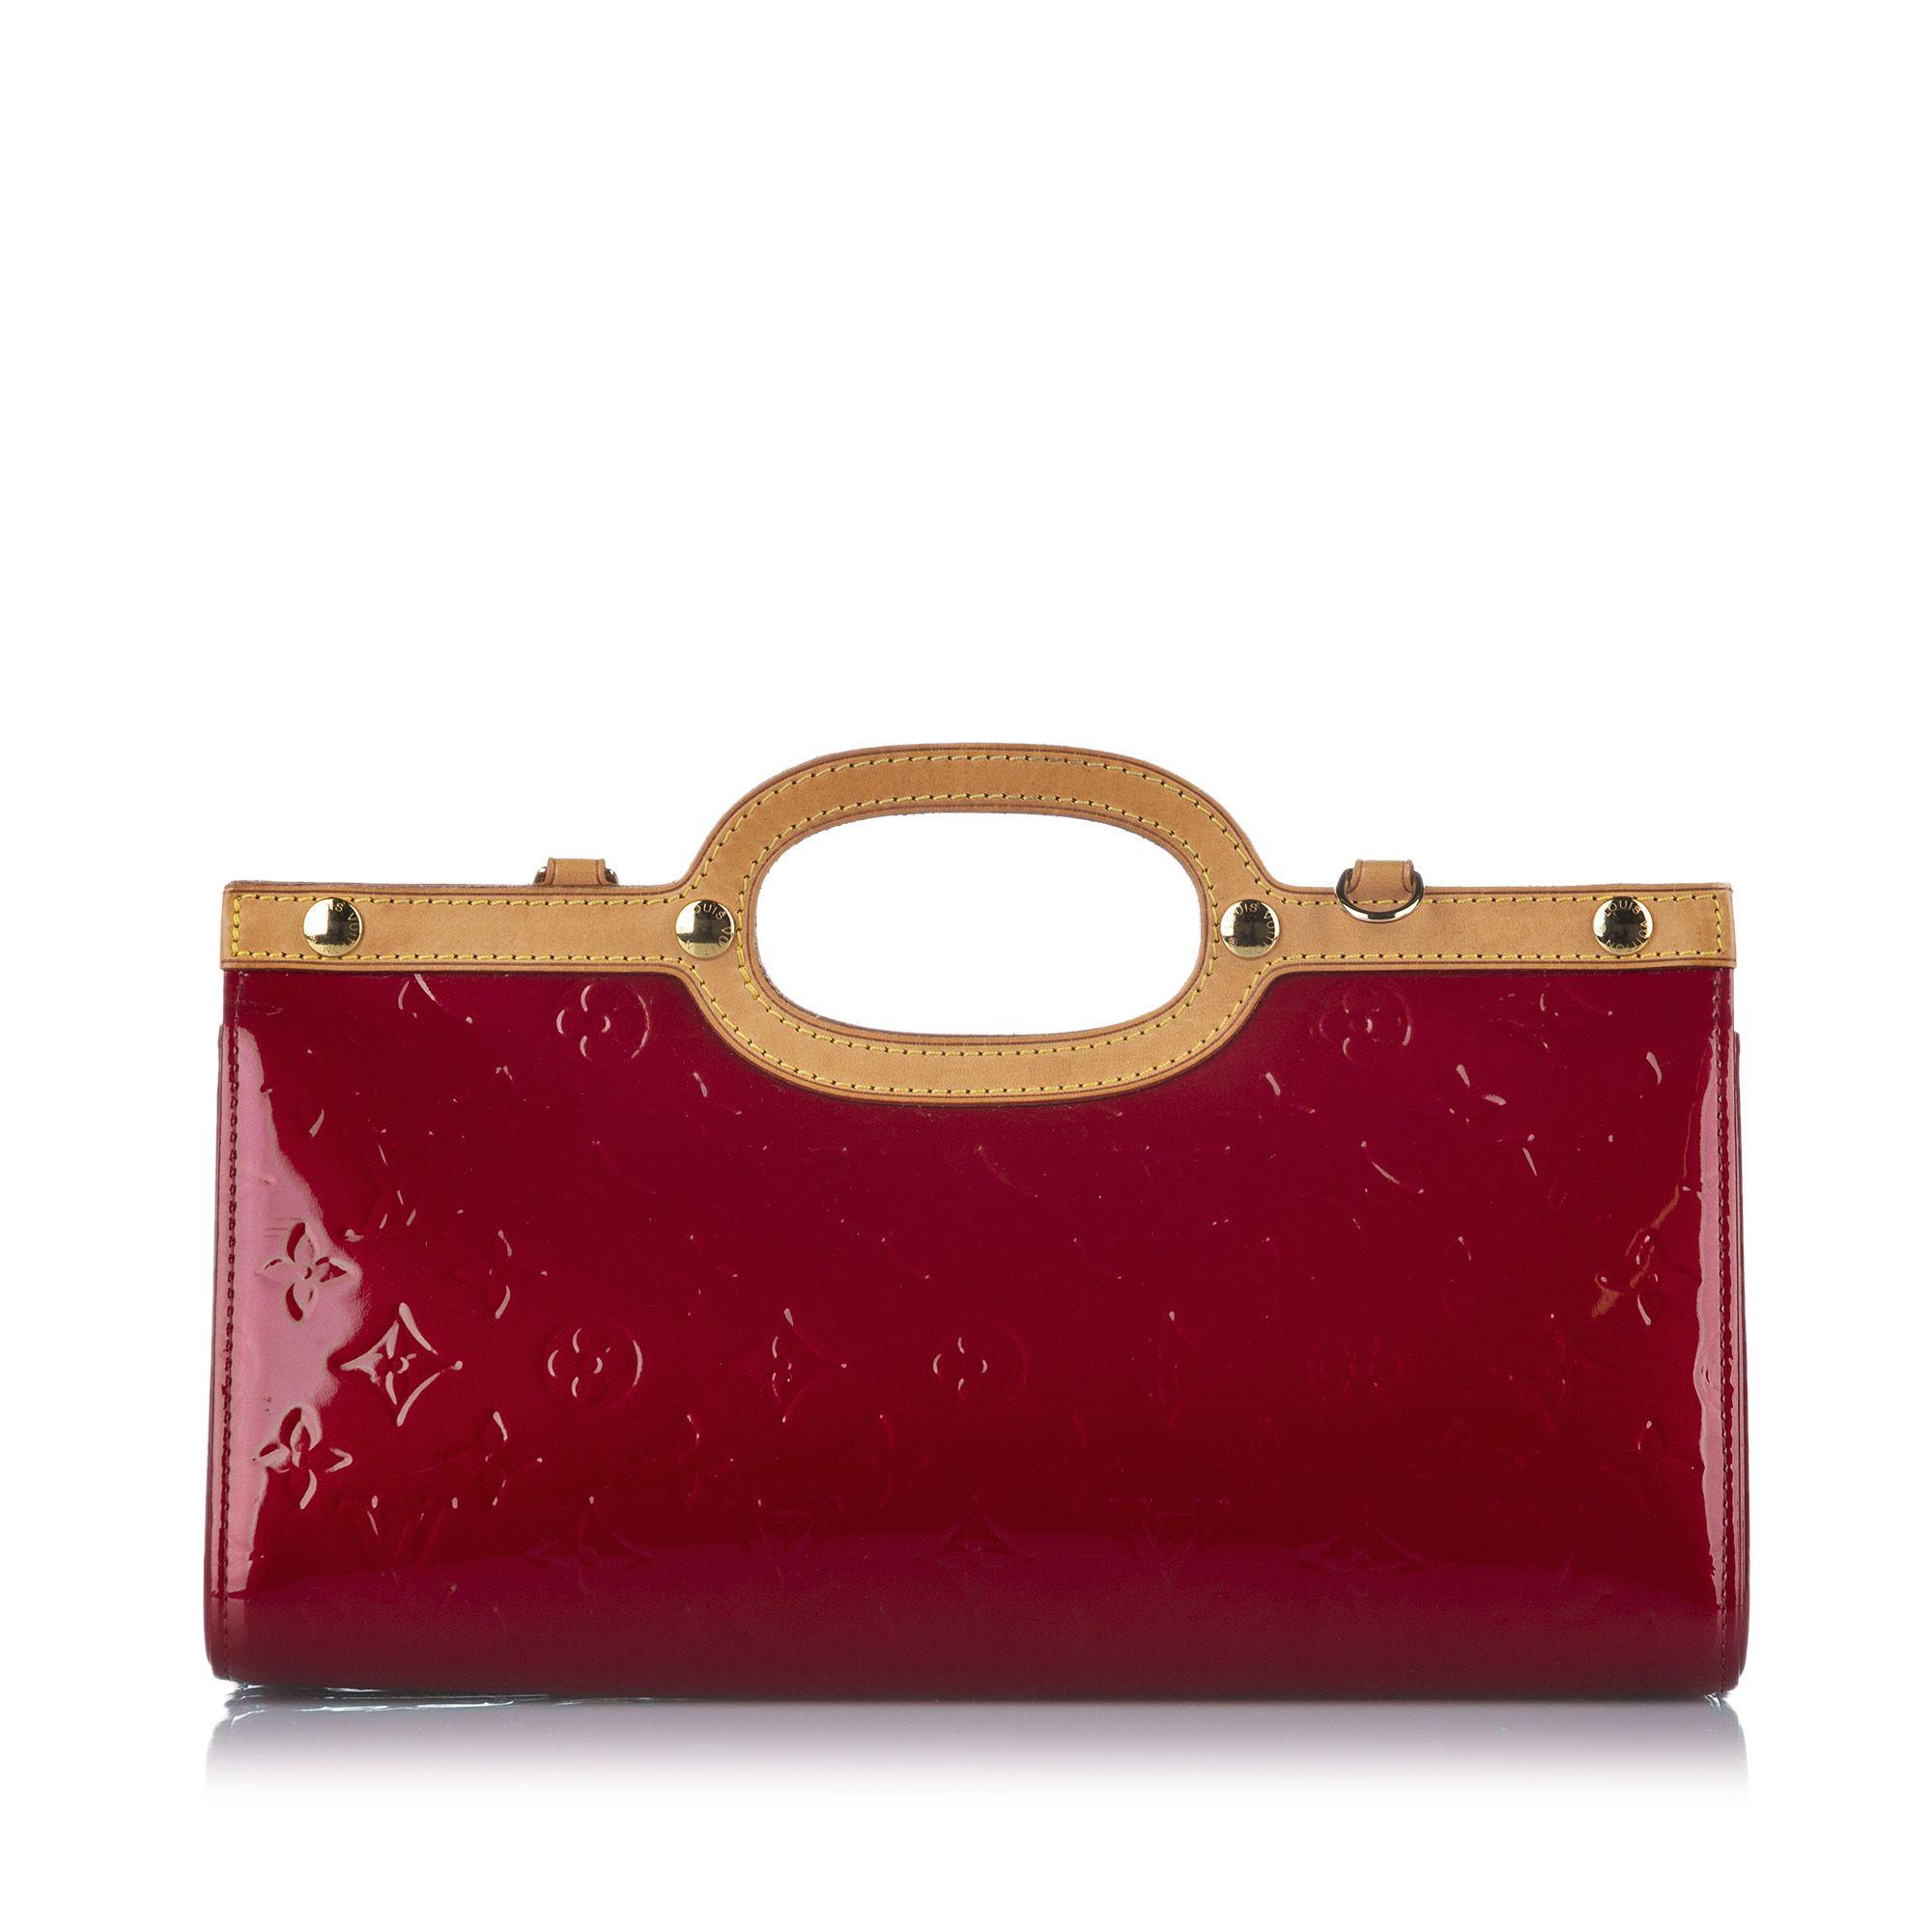 Vintage Louis Vuitton Vernis Roxbury Drive Red